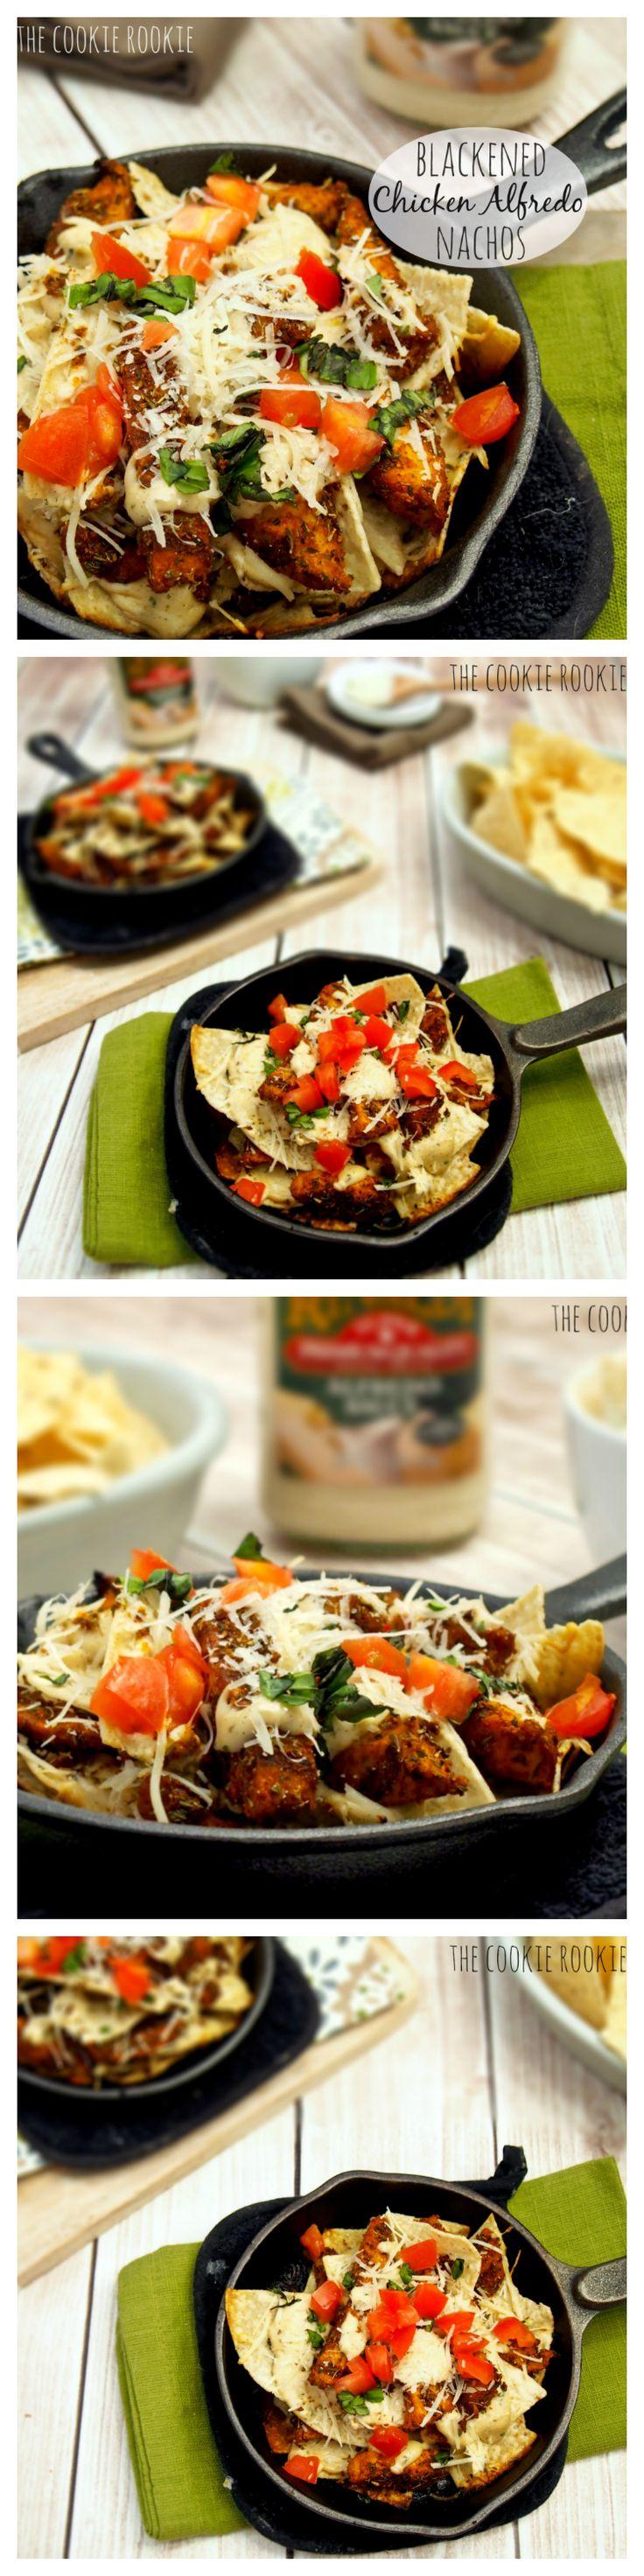 Grilled Blackened Chicken Alfredo Nachos. SOOOO good. Game Changer!! #patraselections #cravings